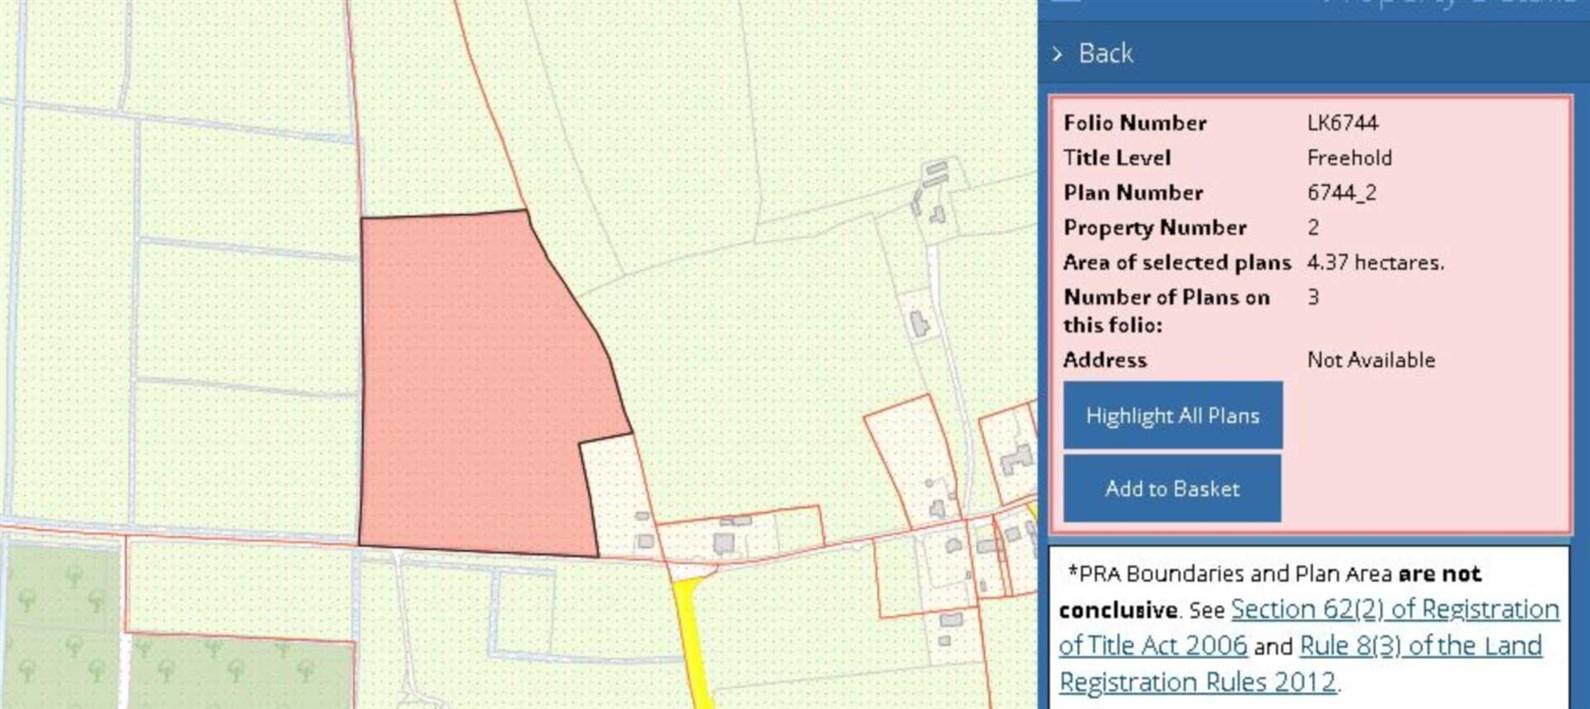 Caherguillamore, Bruff, Co. Limerick